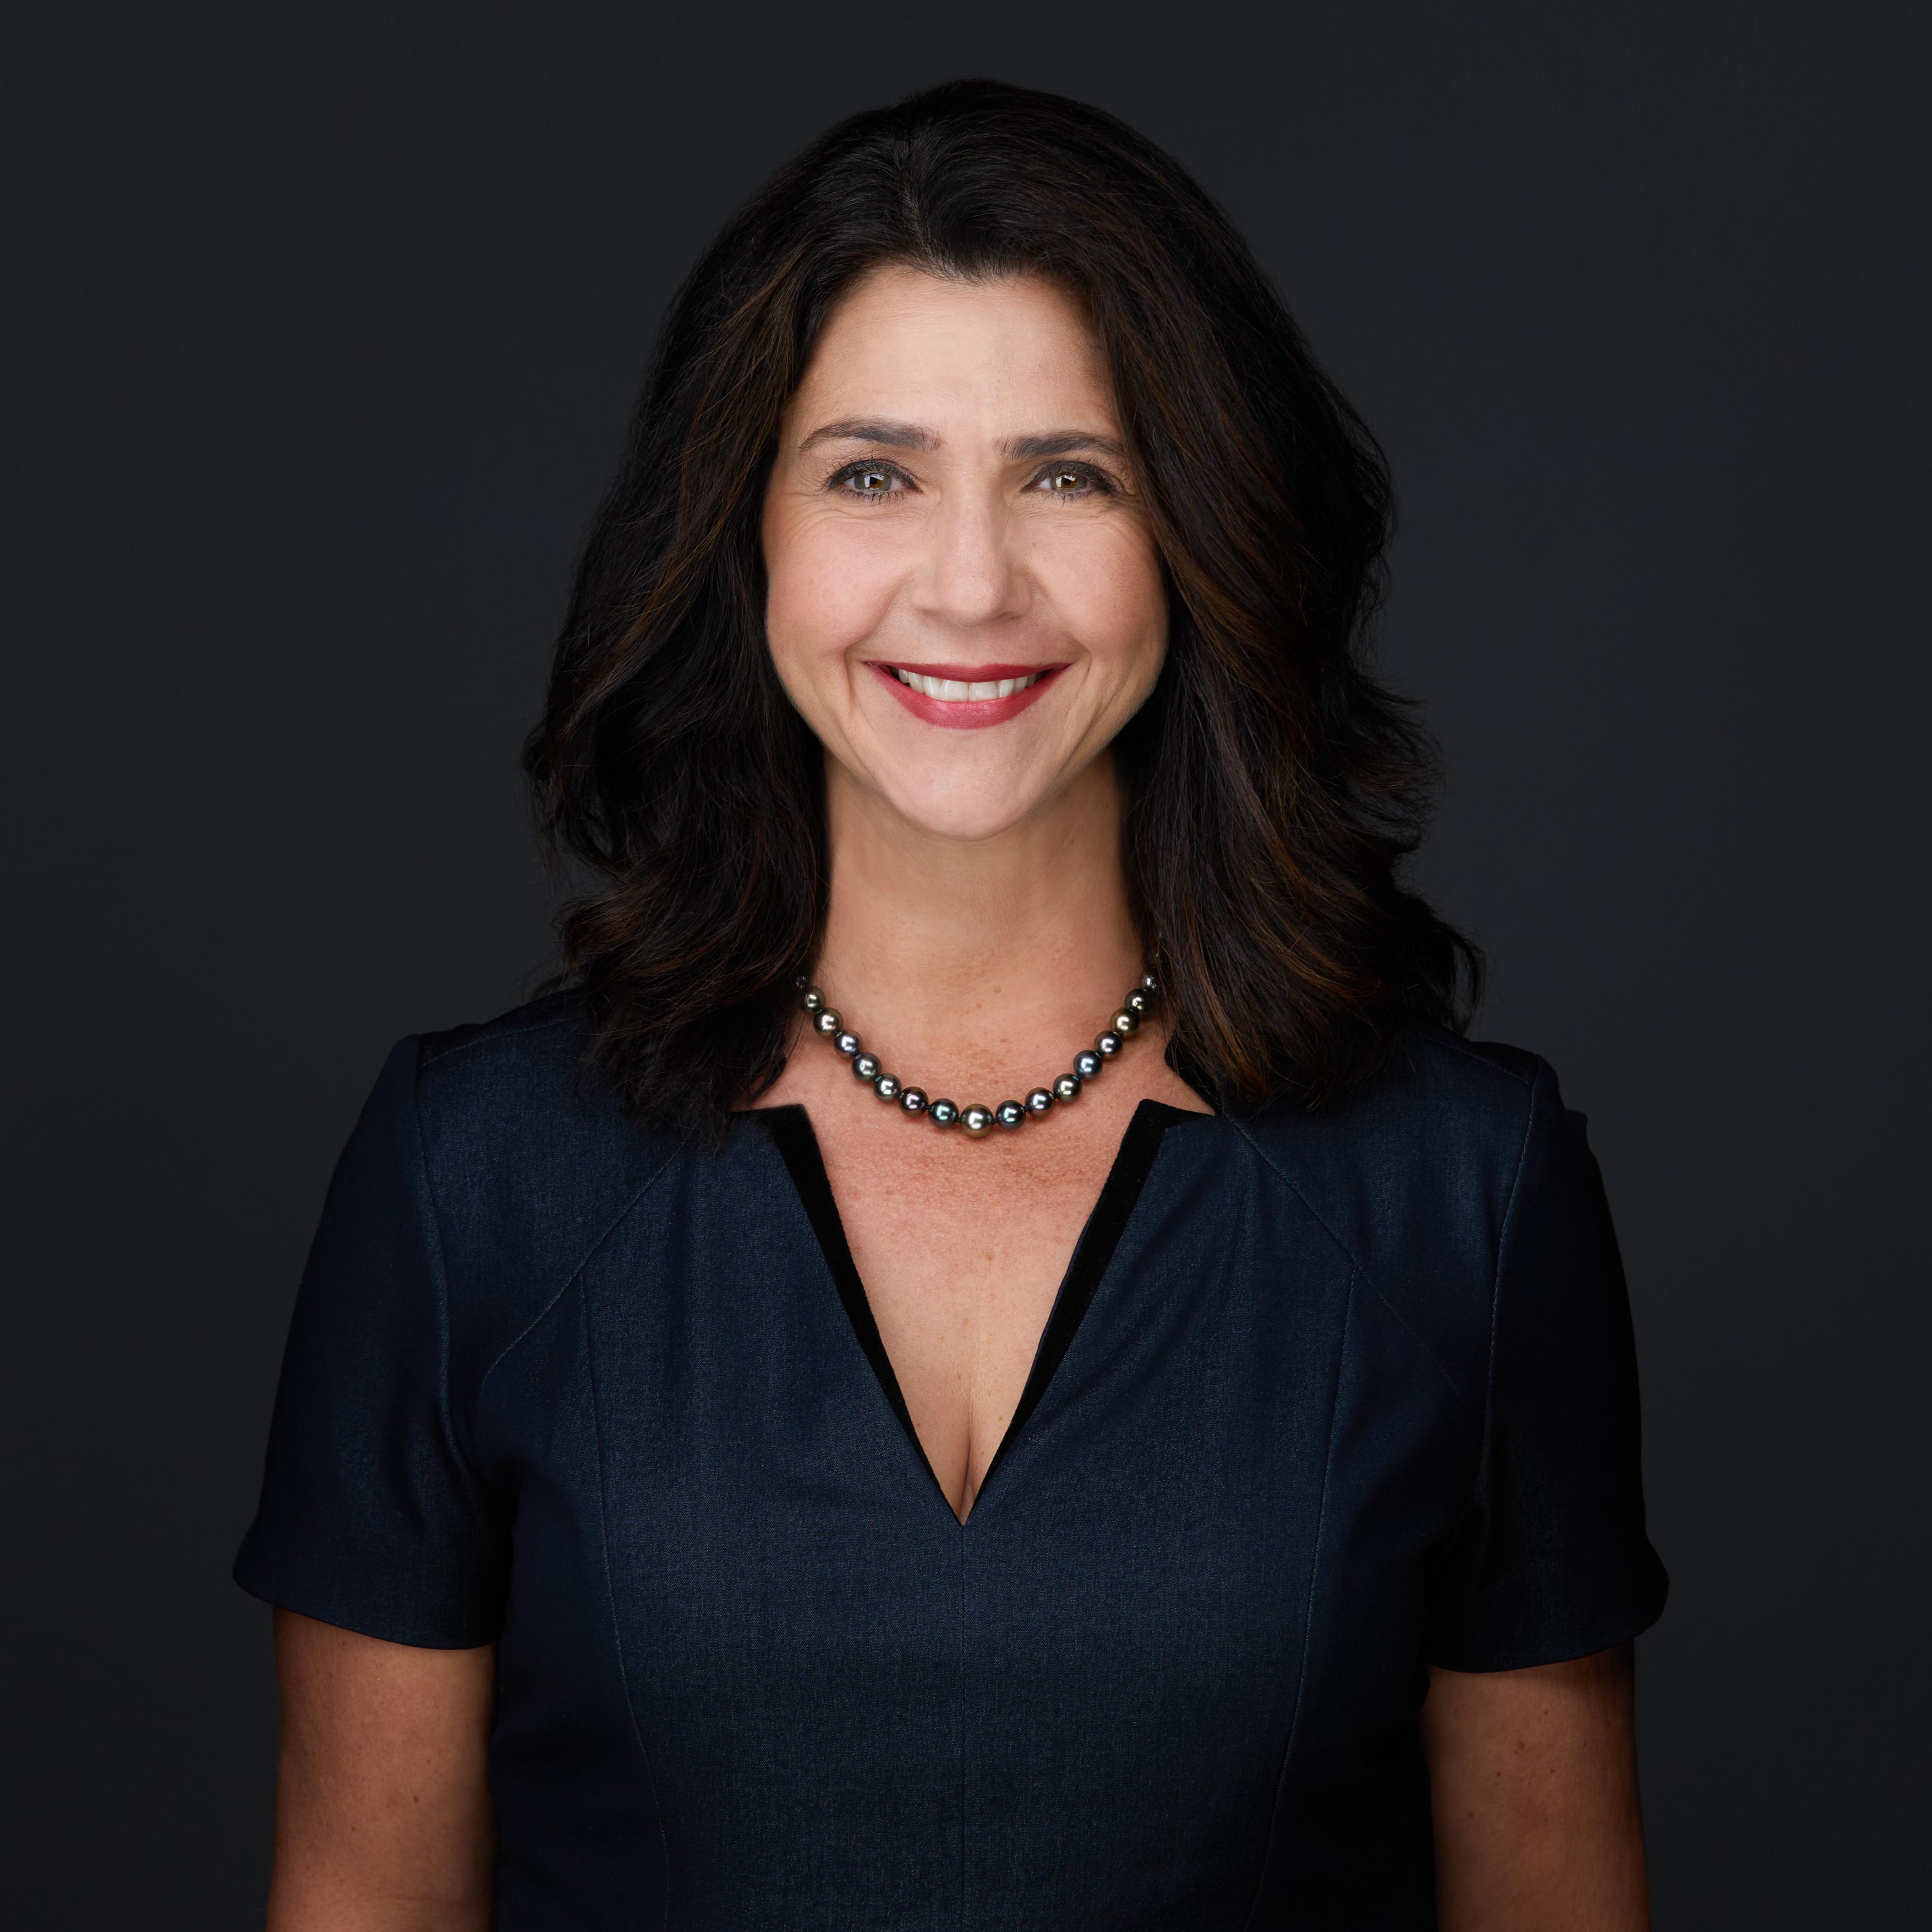 Mirella Esposito